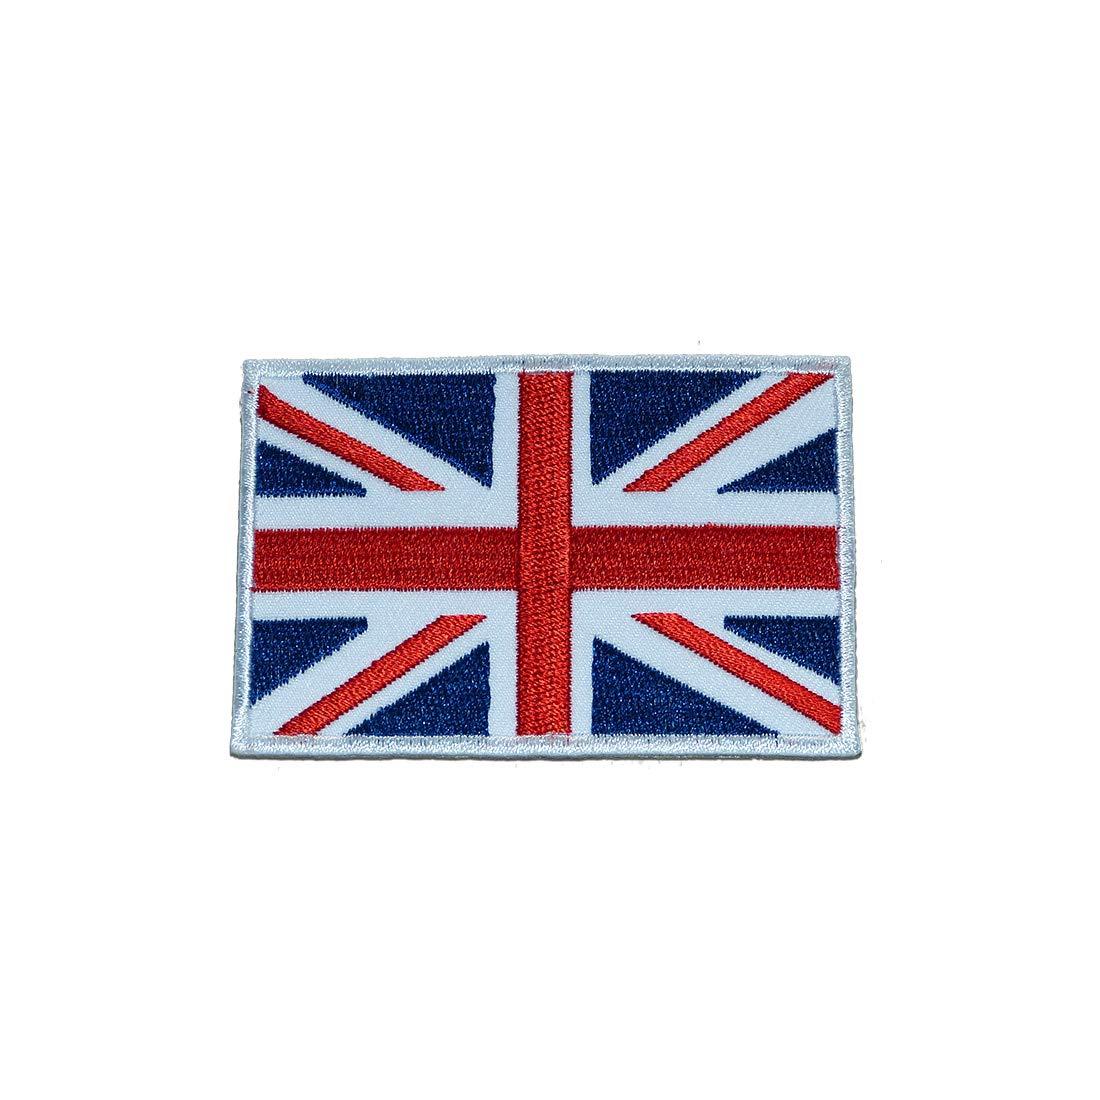 weiß USA ARMY Flagge Fahne 7,5 x 4,7 cm Aufnäher // Bügelbild